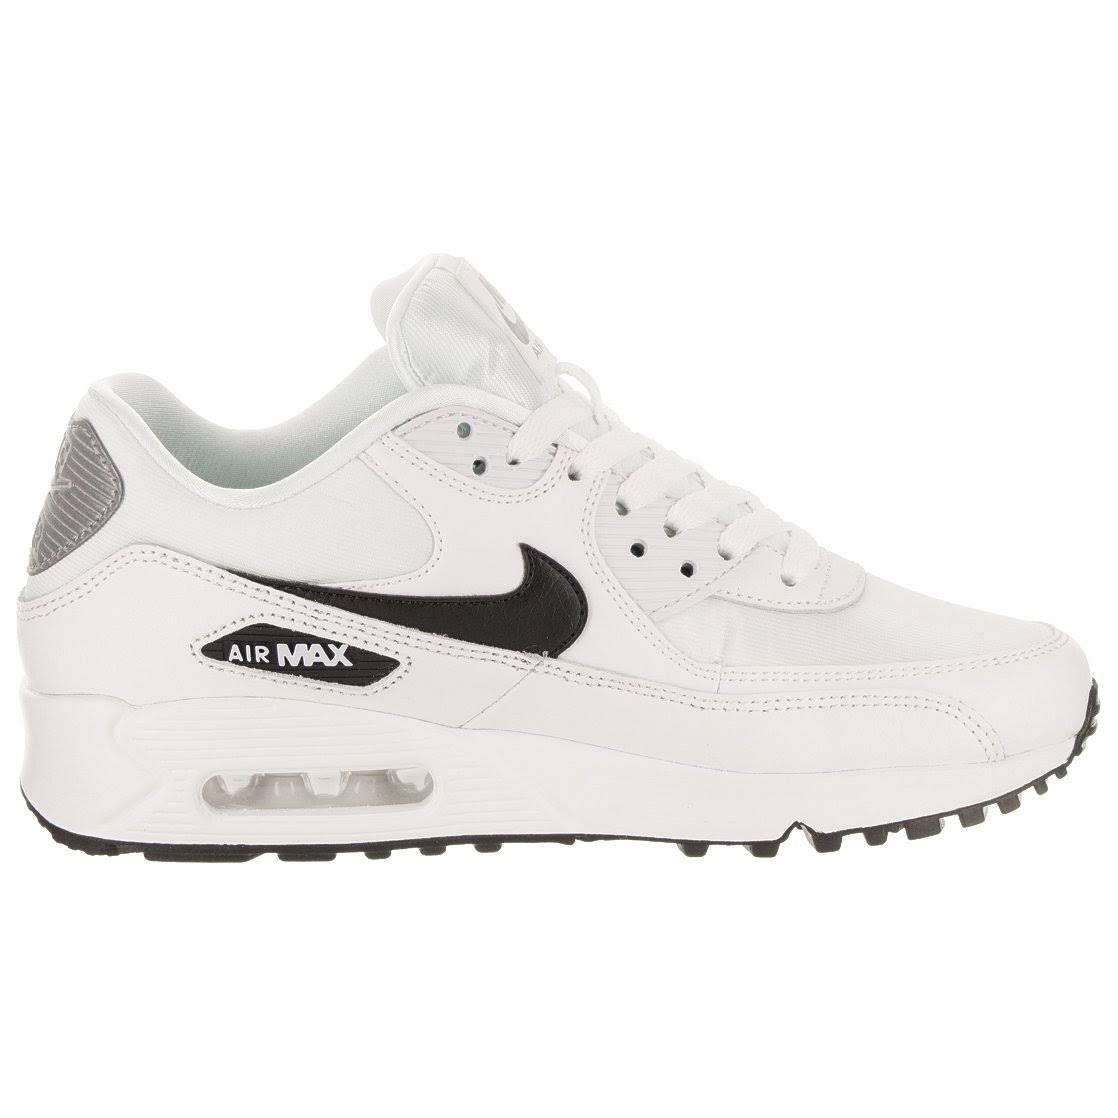 Negro 90 Blanco Silver Nike Air Hombres Reflect Max RfzwxX